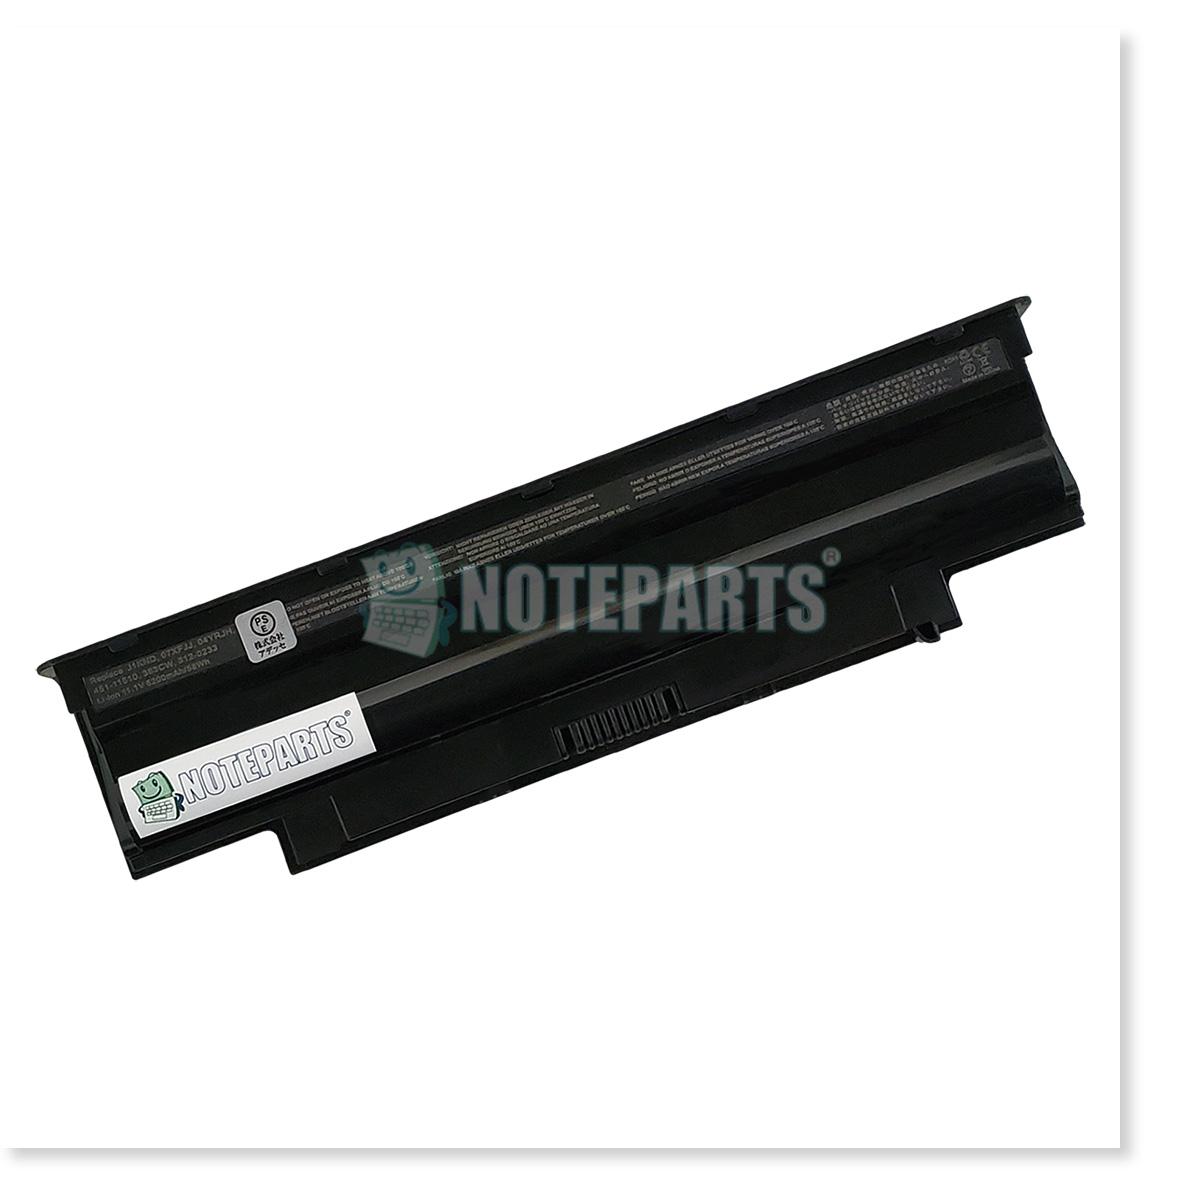 Dell デル Inspiron 13 14 15 17 Vostro 1440 1540 3450 3550 3750 6セル バッテリー 8NH55 WT2P4 312-023H対応